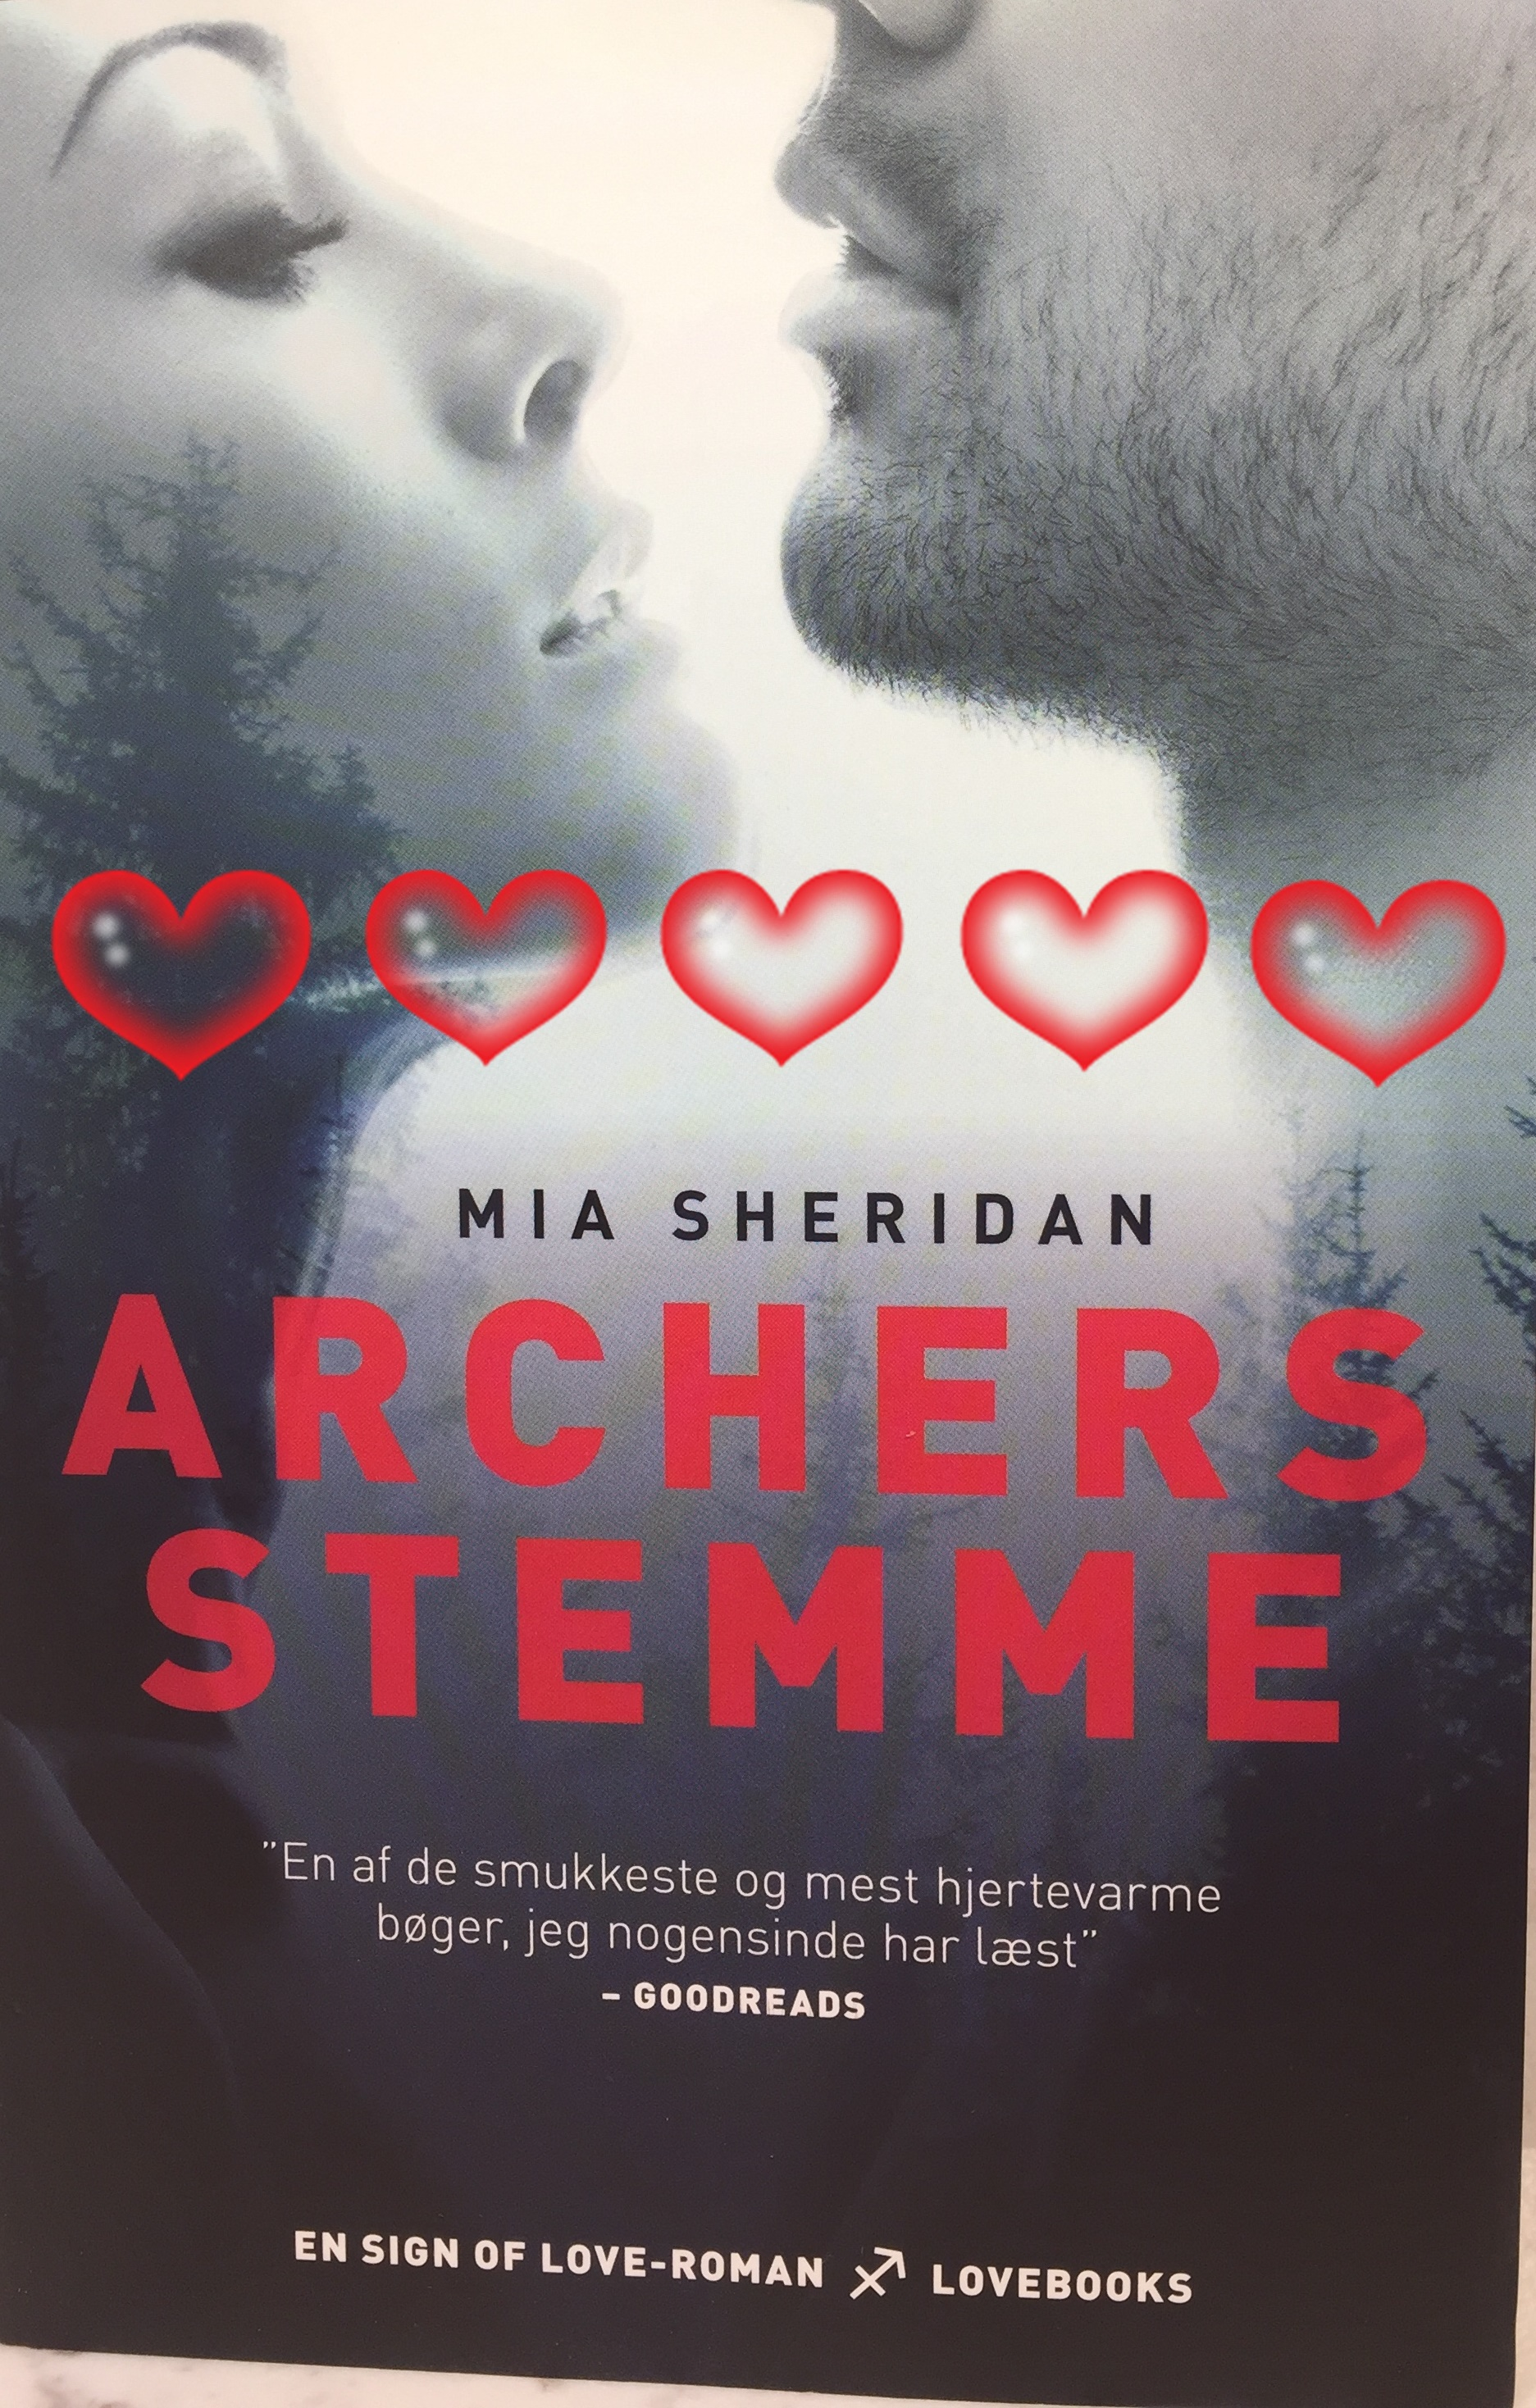 Archers Stemme, Boganmeldelse Archers Stemme, Mia Sheridan, Love Books, Lindhardt og Ringhoff, Anmeldereksemplar,